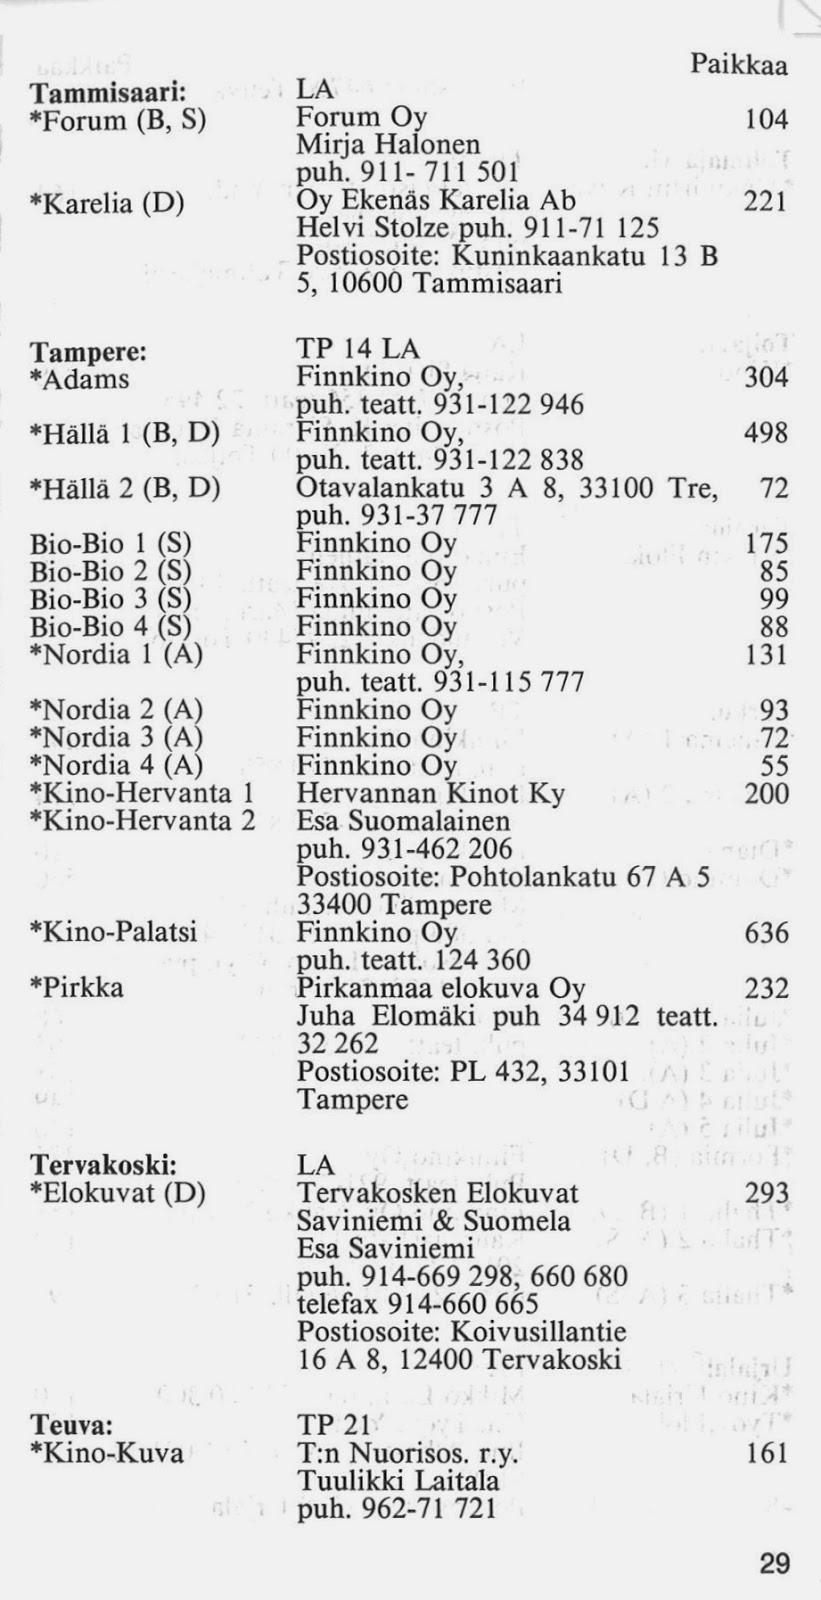 Tampereen Elokuvateatterit